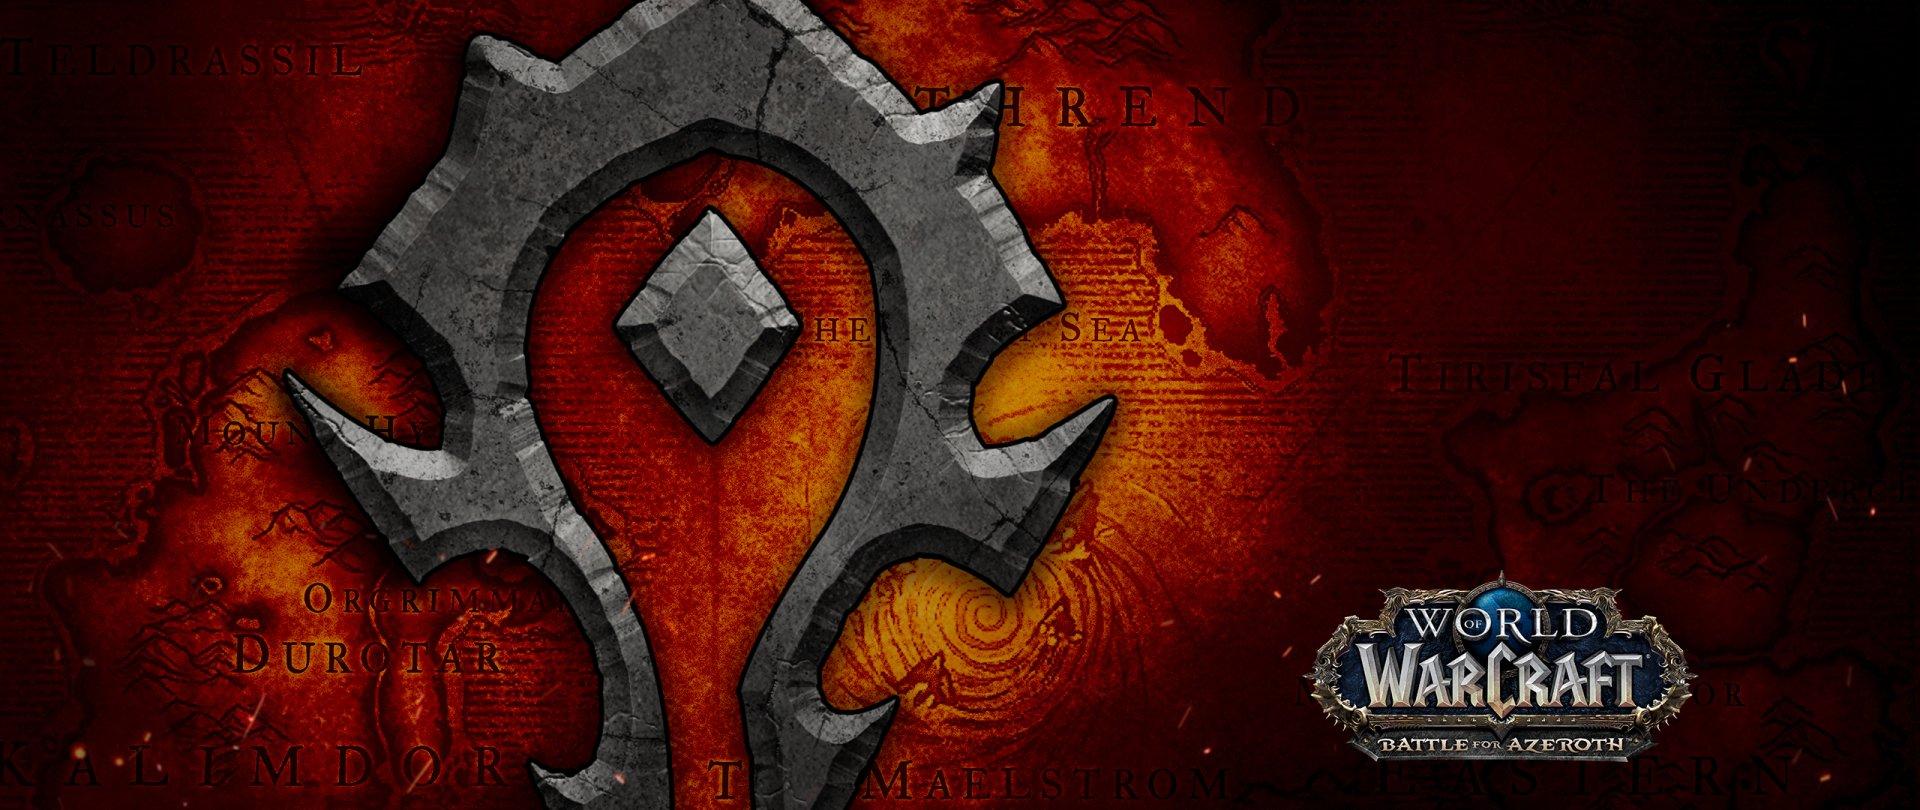 Bfa Hd Wallpaper: World Of Warcraft: Battle For Azeroth Fondo De Pantalla HD